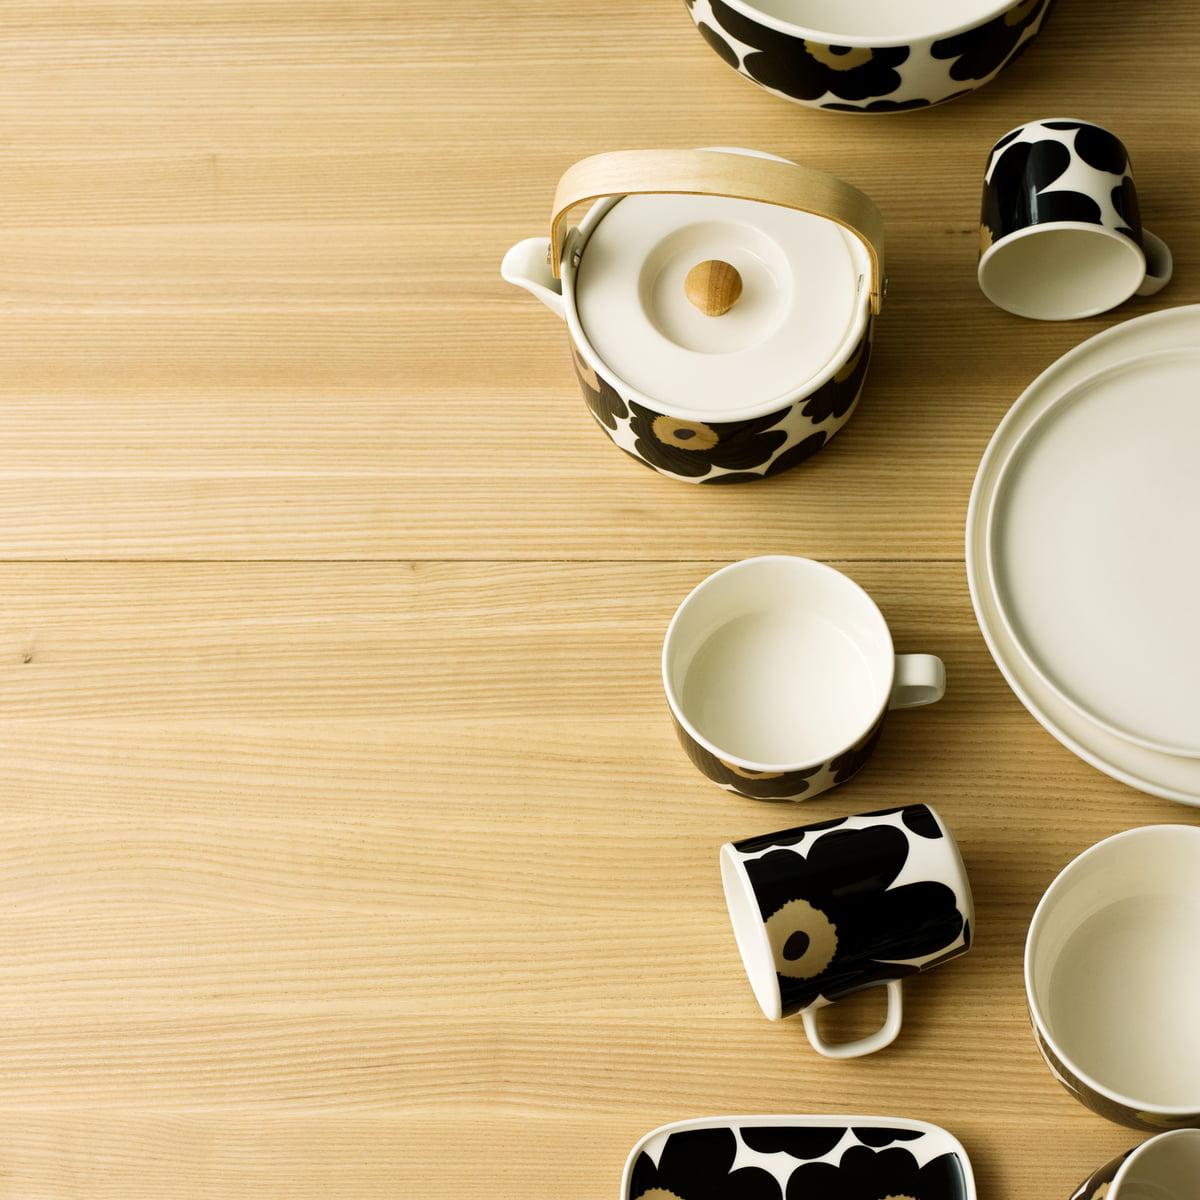 oiva unikko becher mit henkel von marimekko. Black Bedroom Furniture Sets. Home Design Ideas